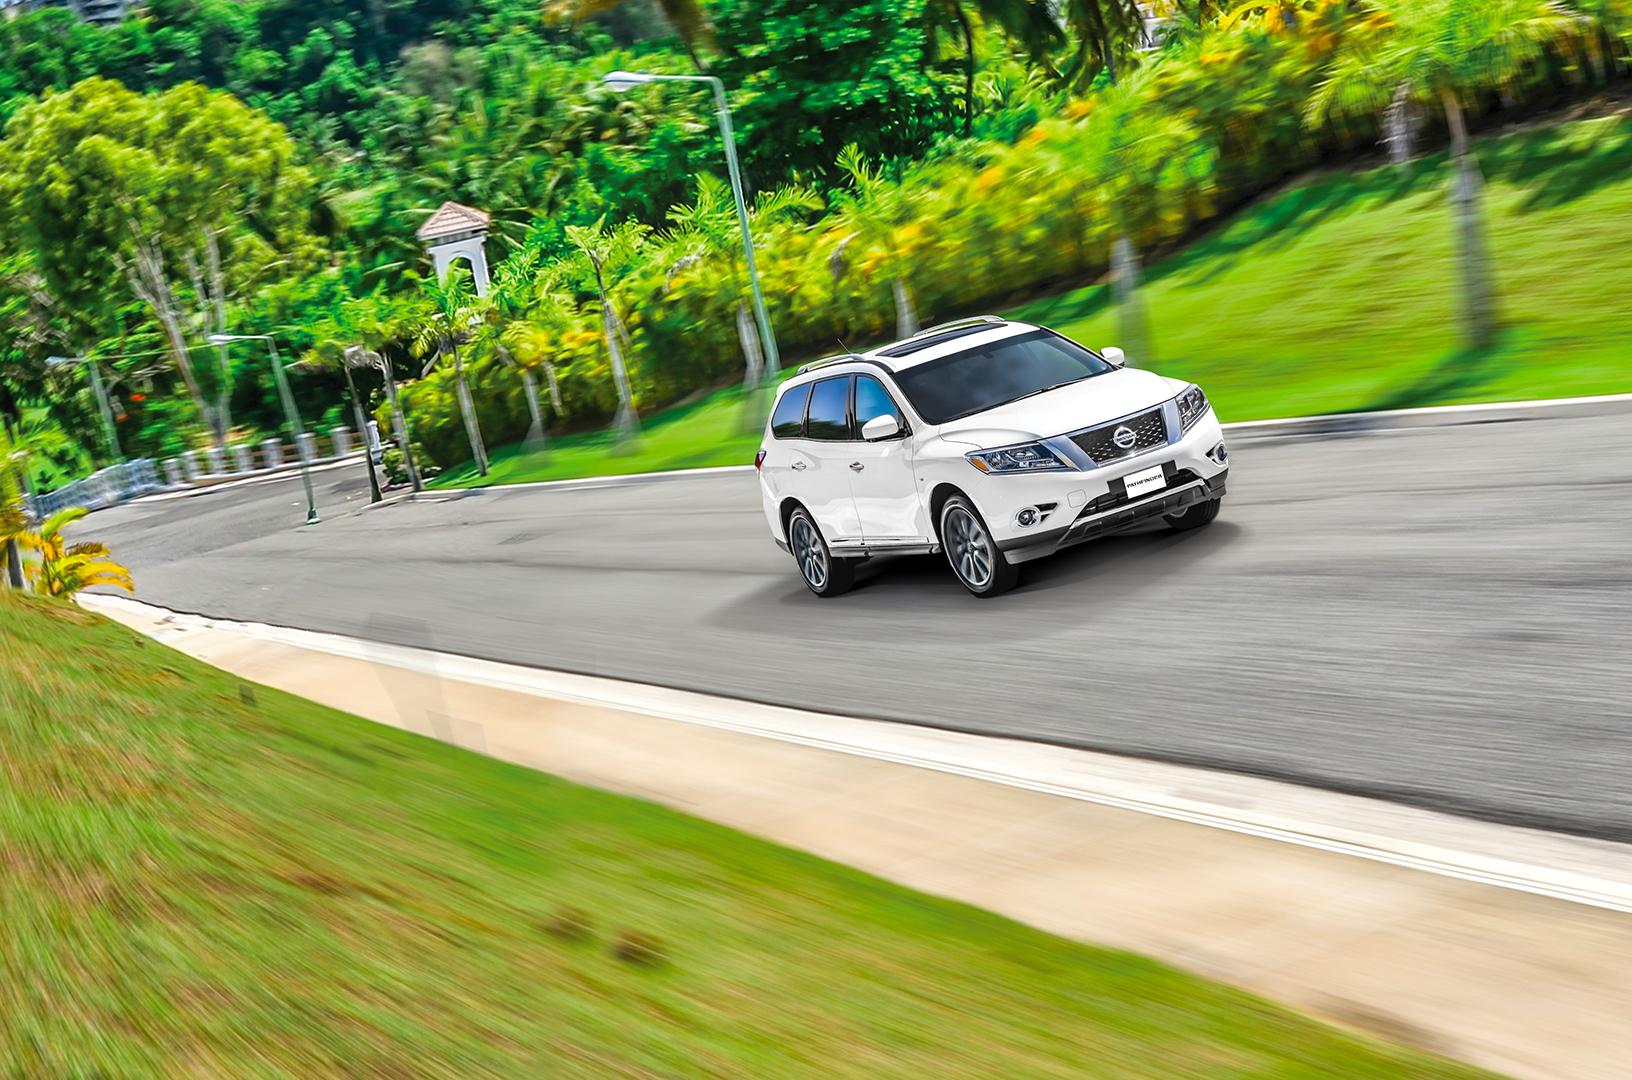 La Totalmente Nueva Nissan Pathfinder - makinas (19)